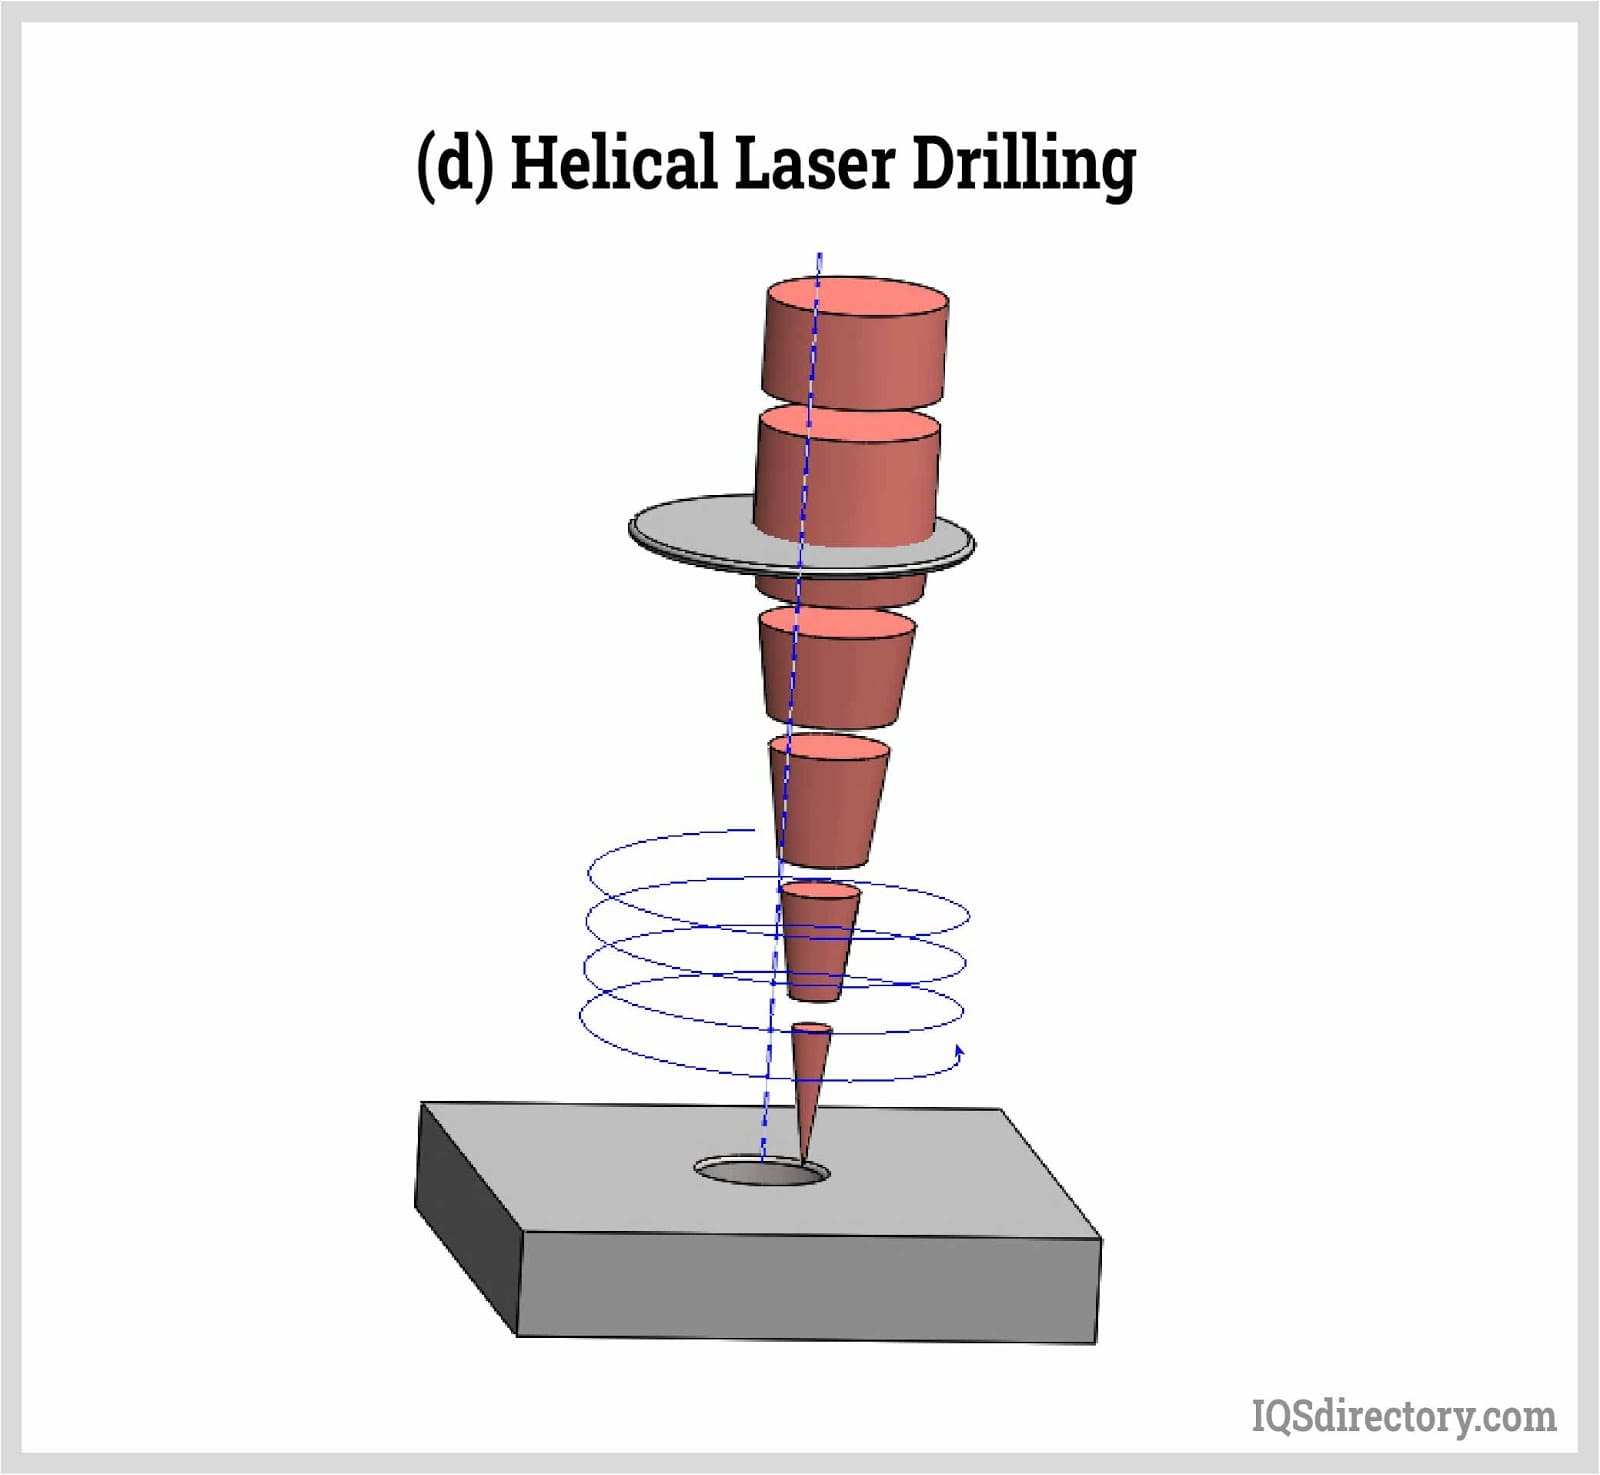 Helical Laser Drilling